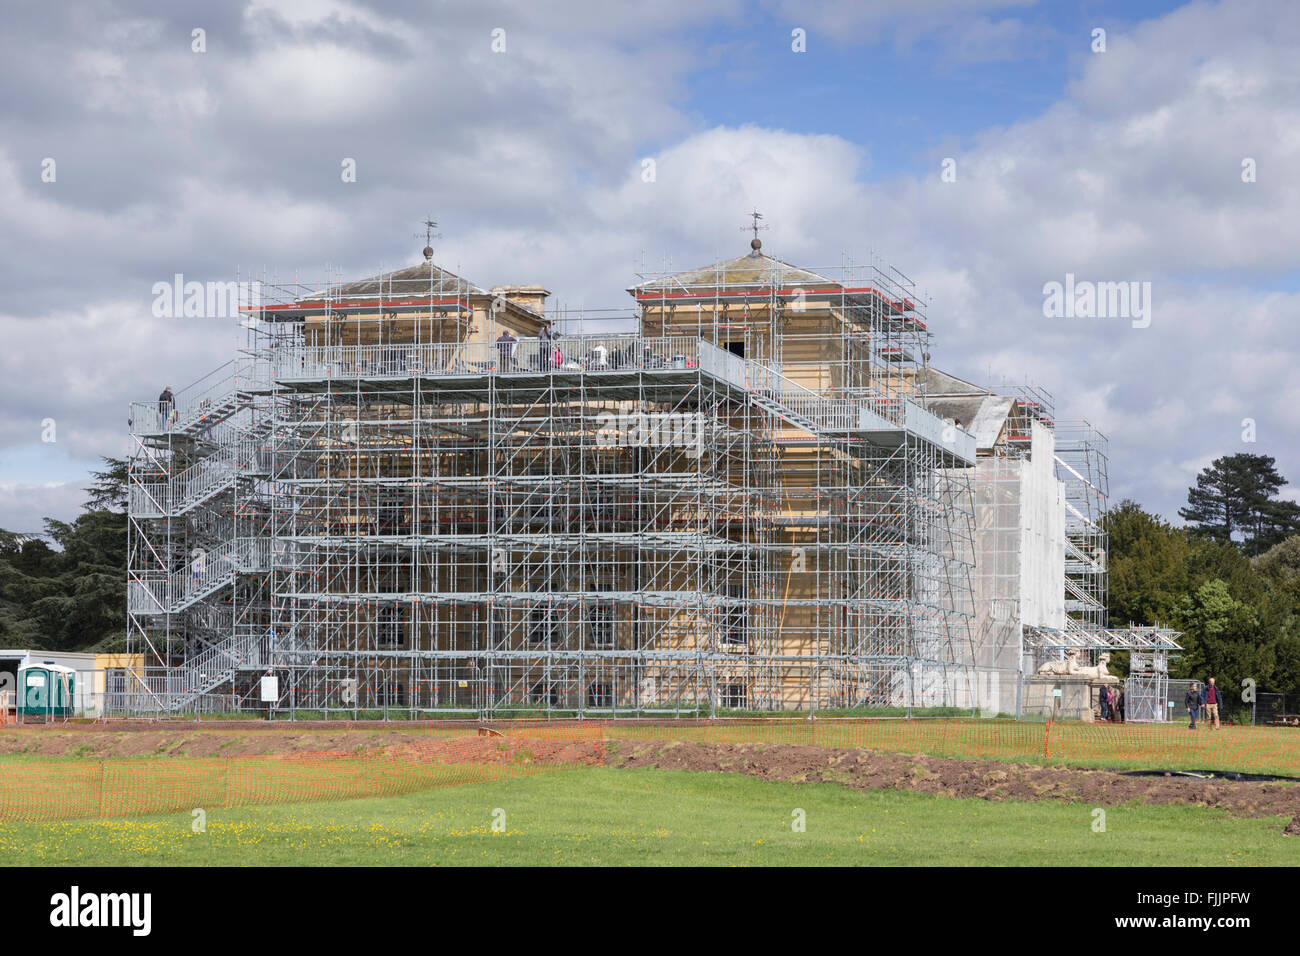 Scaffolding around Croome Court, Worcestershire, England, UK - Stock Image